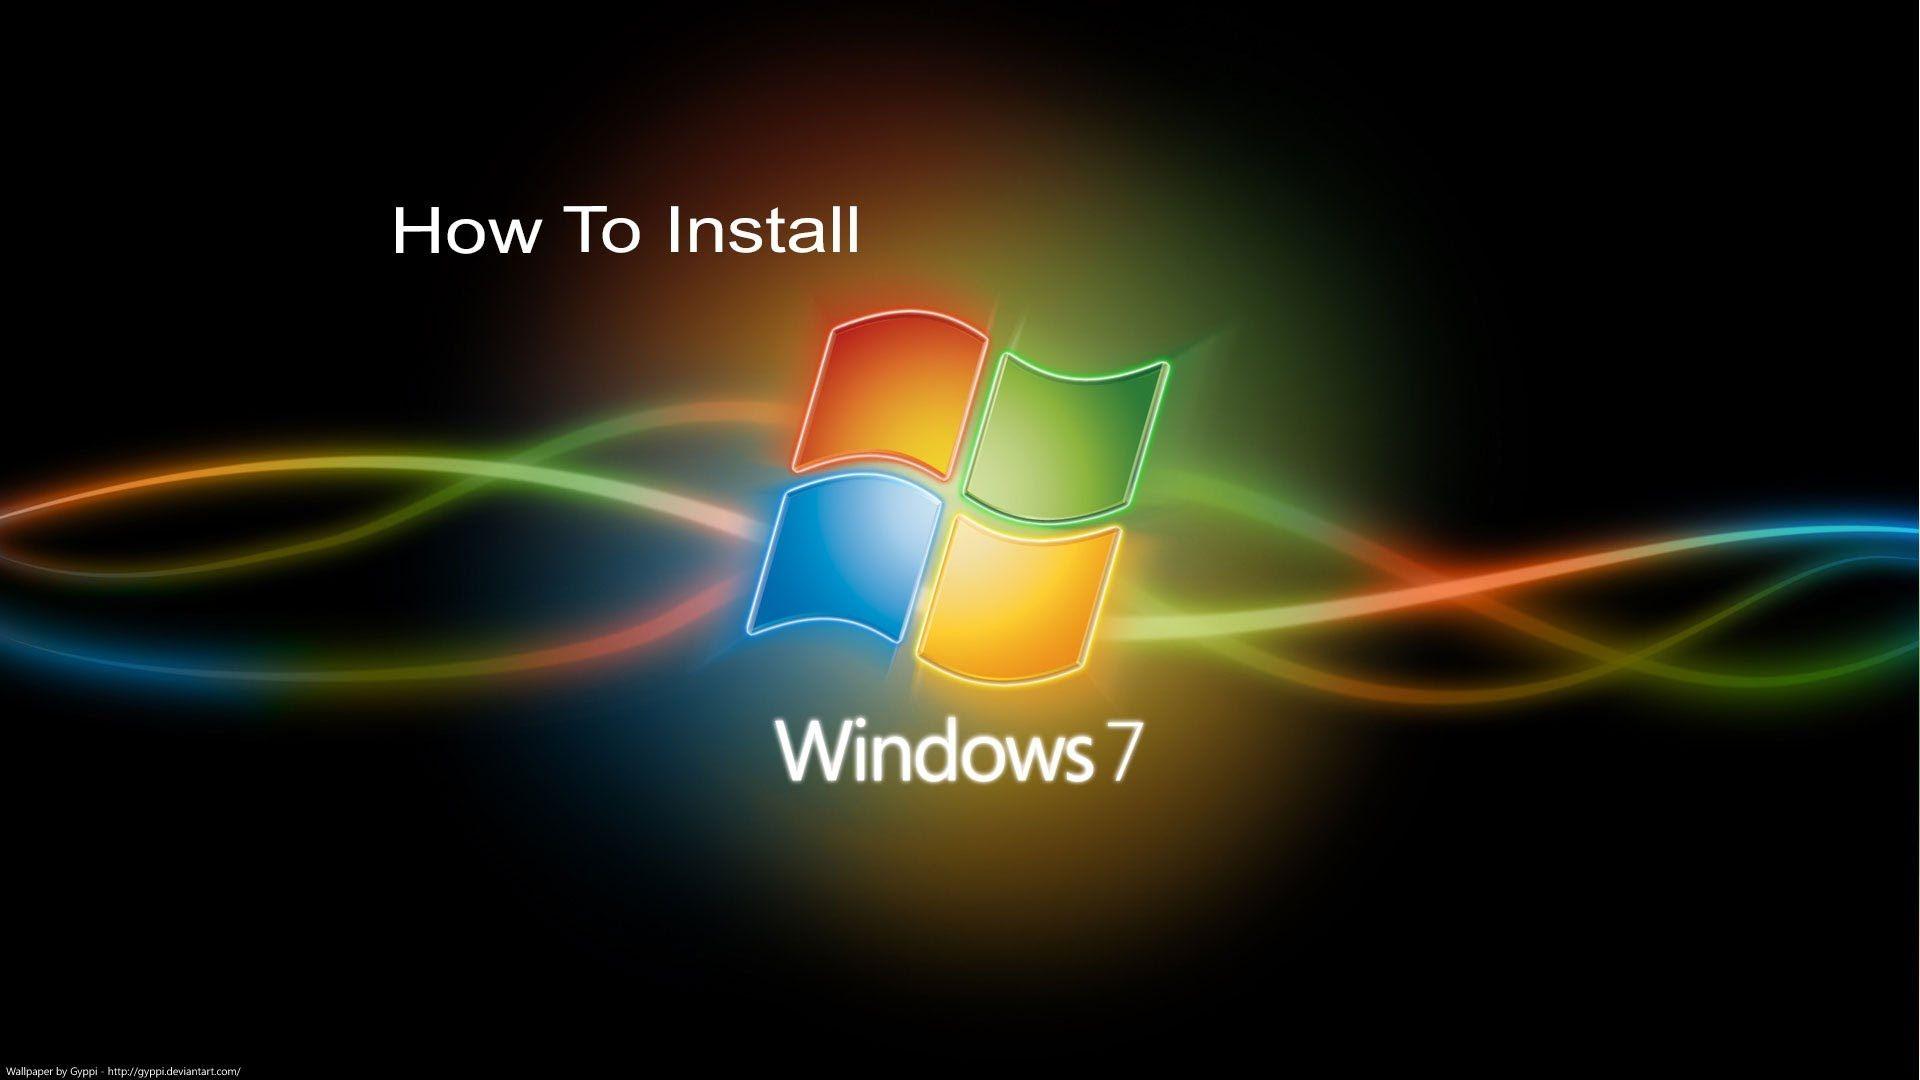 How To Install Windows 7 In Your Desktop And Laptops Windows Wallpaper Backgrounds Desktop Windows